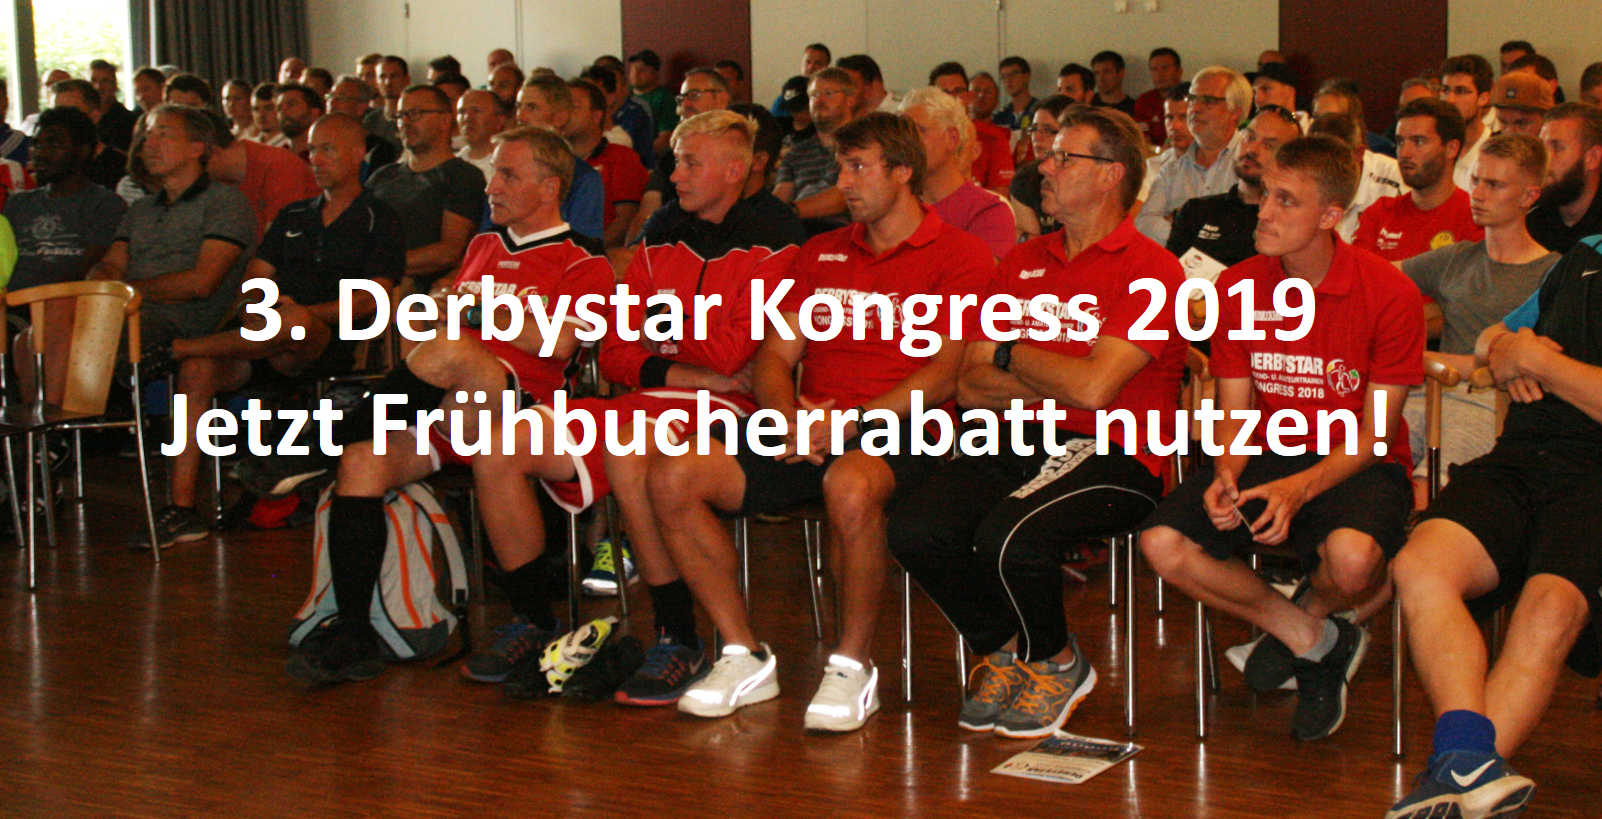 3. Derbystar Kongress 2019